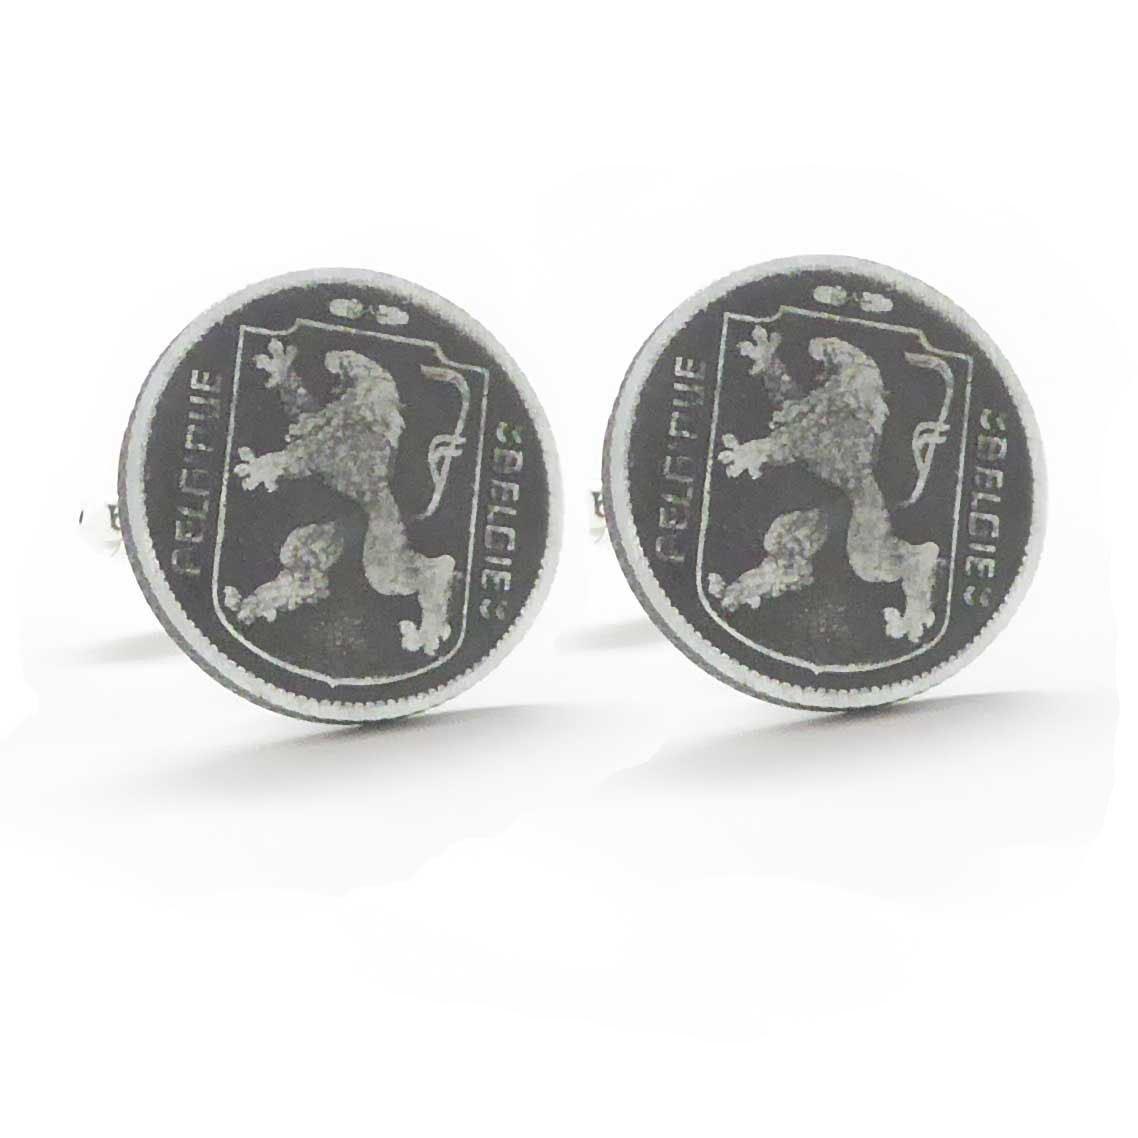 Belgium Coin Cufflinks Cuff Links Europe Belgie Belgique Dutch Flemish manchetknopen